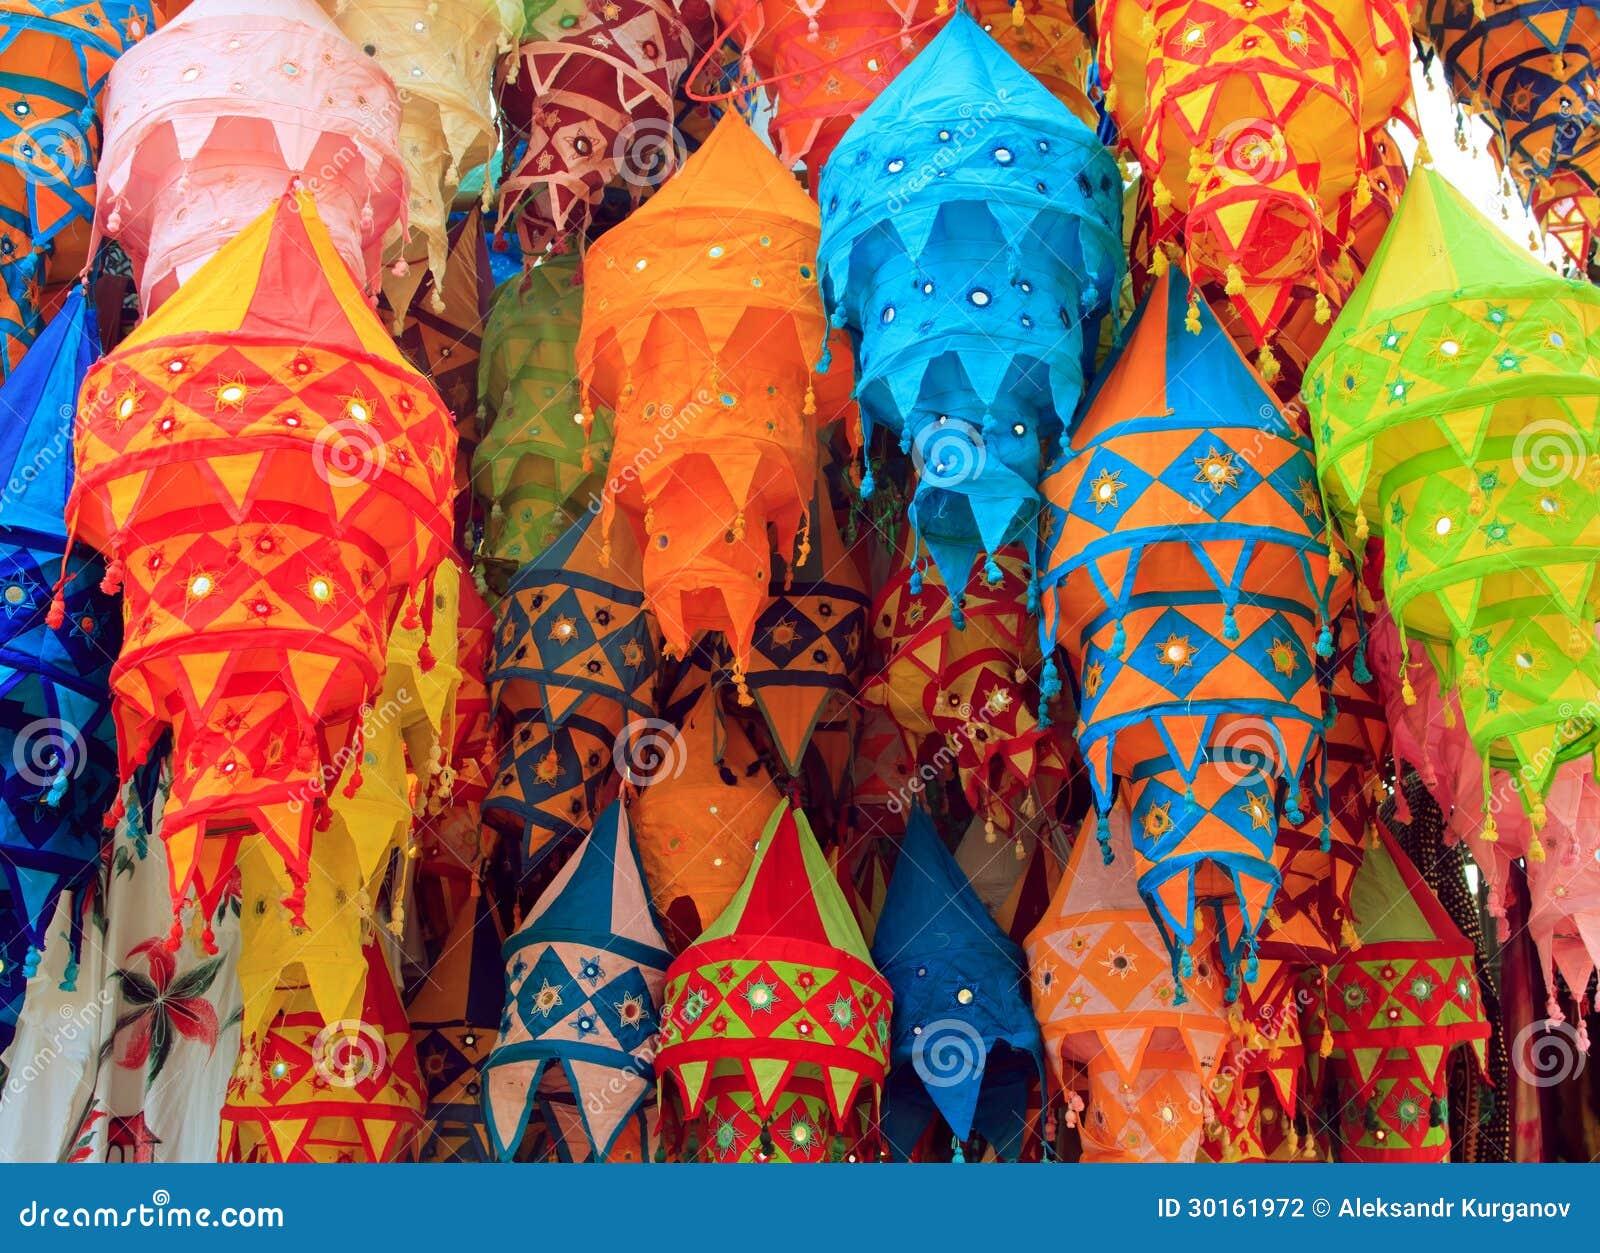 Tibet Color Chandelier Stock Photo Image Of Bright